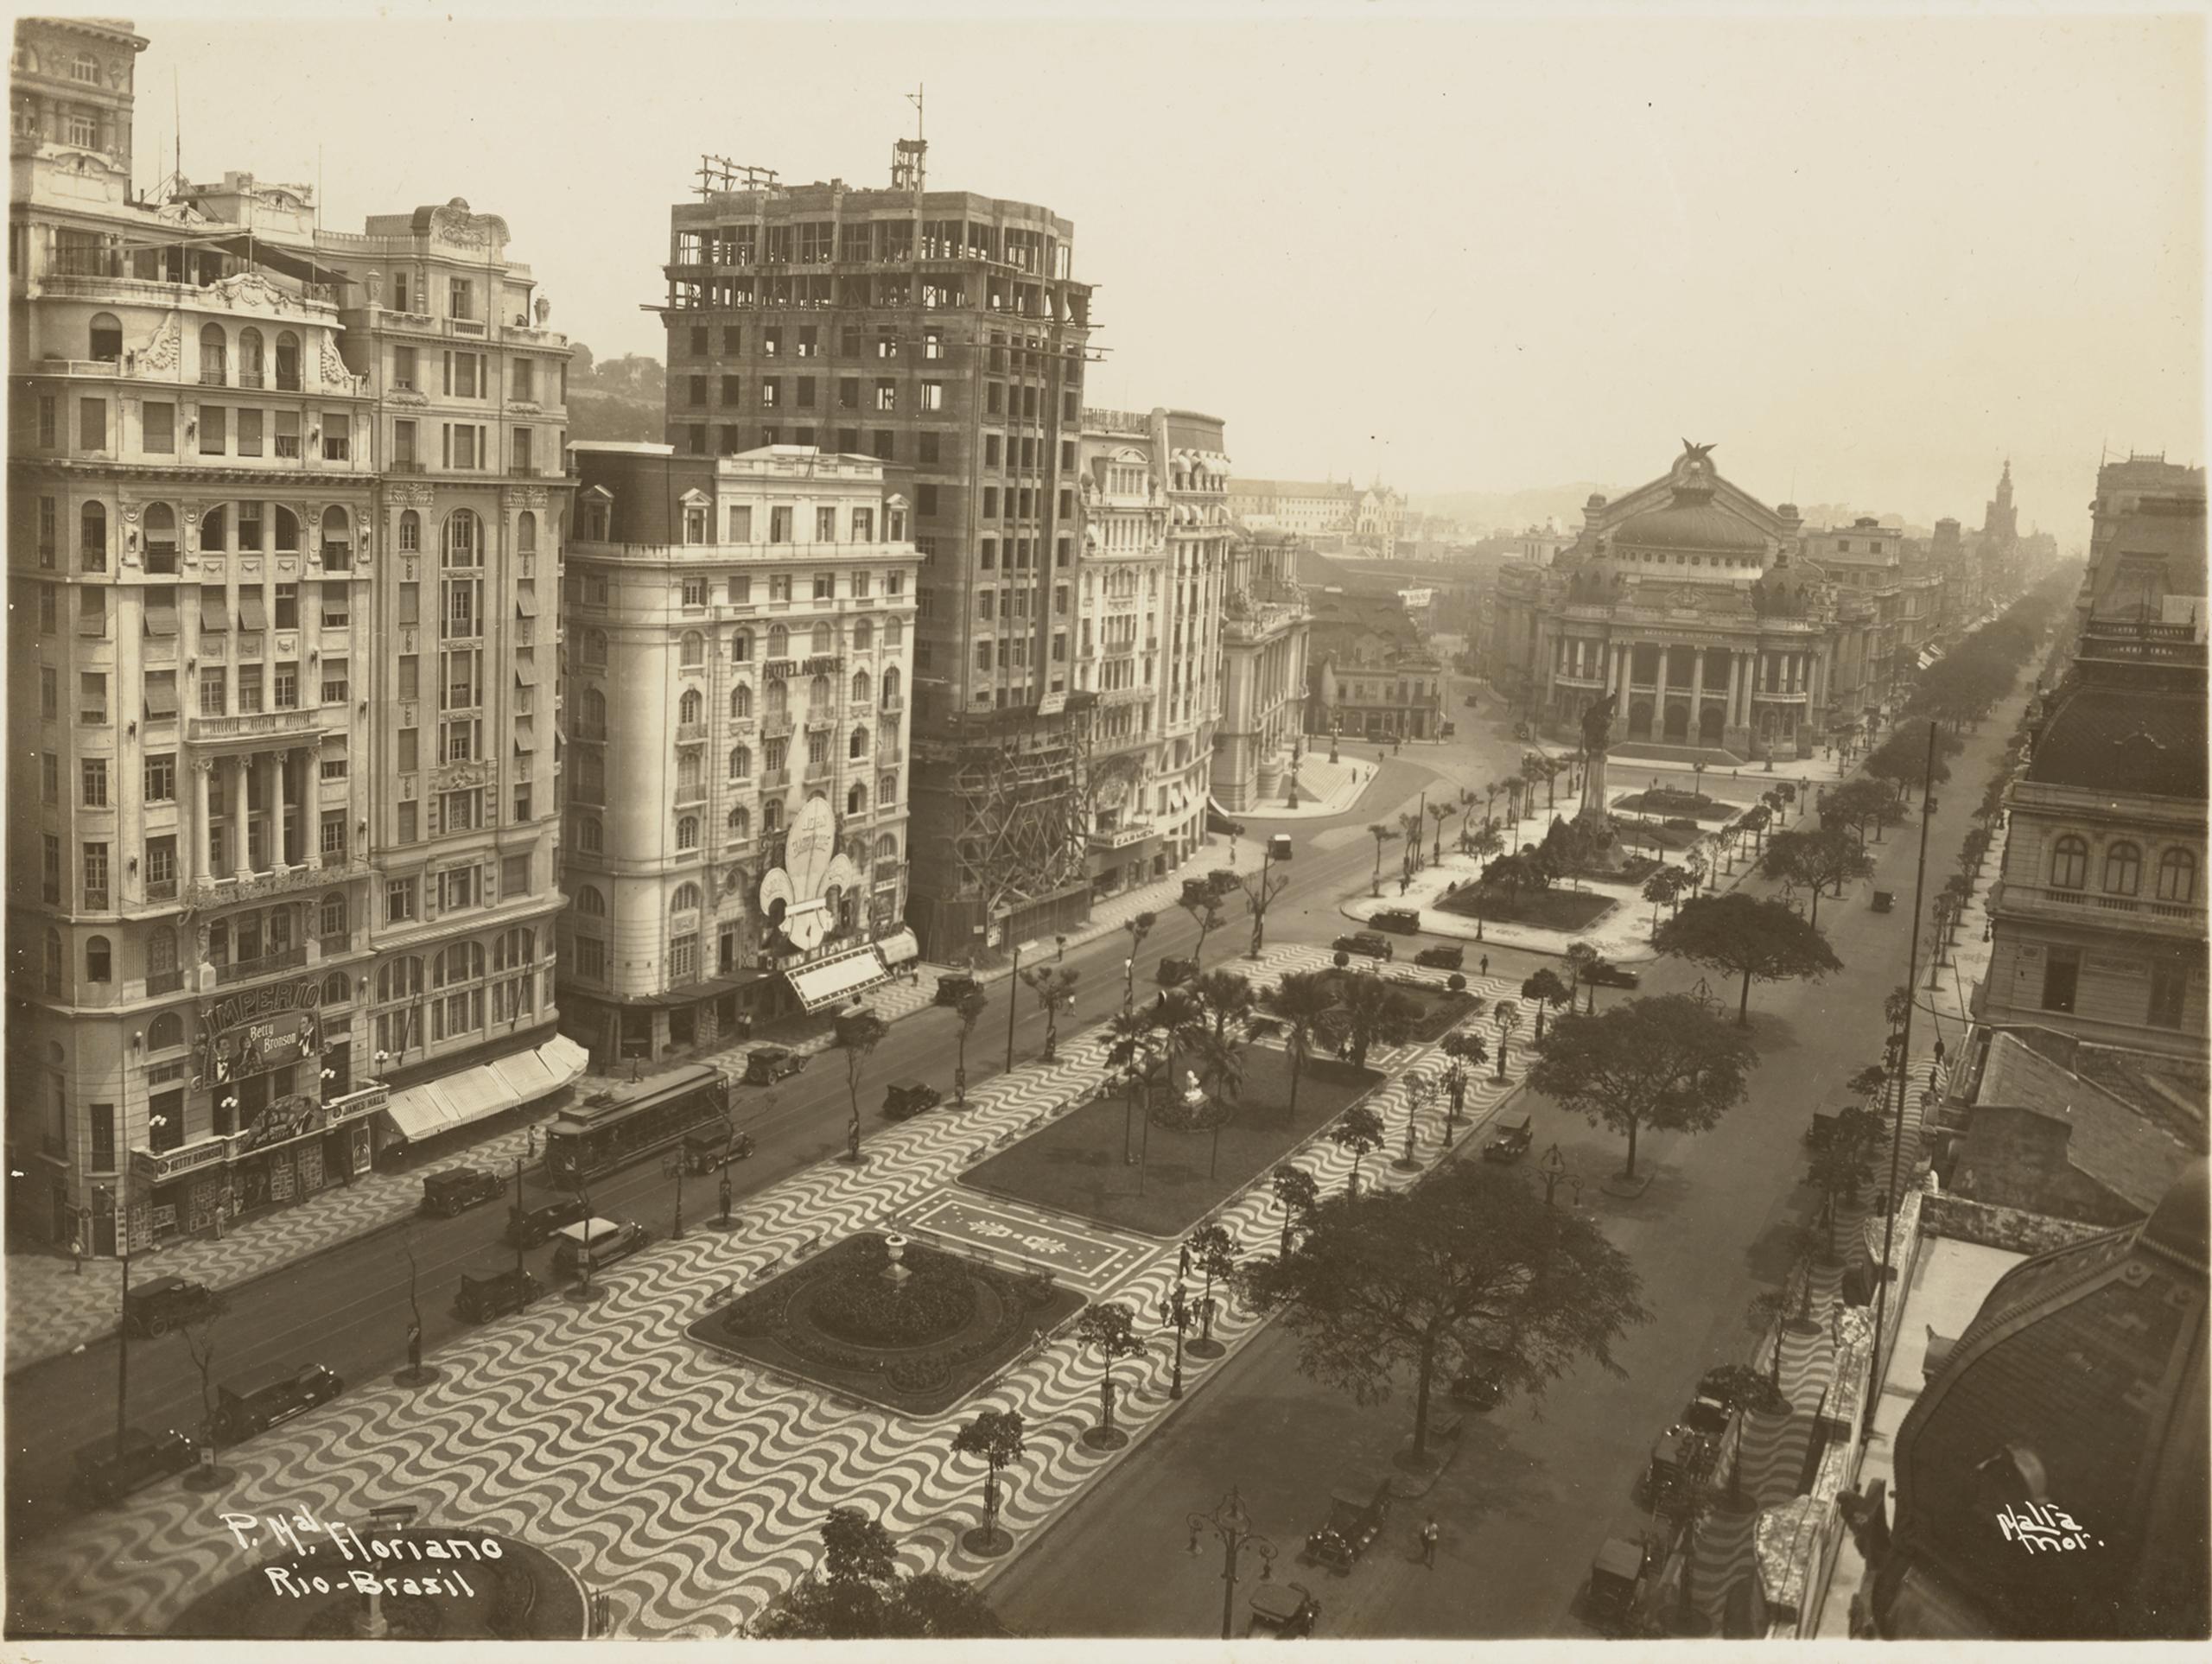 P. Mal [Praça Marechal] Floriano, Rio-Brasil | La metrópolis en América Latina, 1830-1930 | Museo Amparo, Puebla